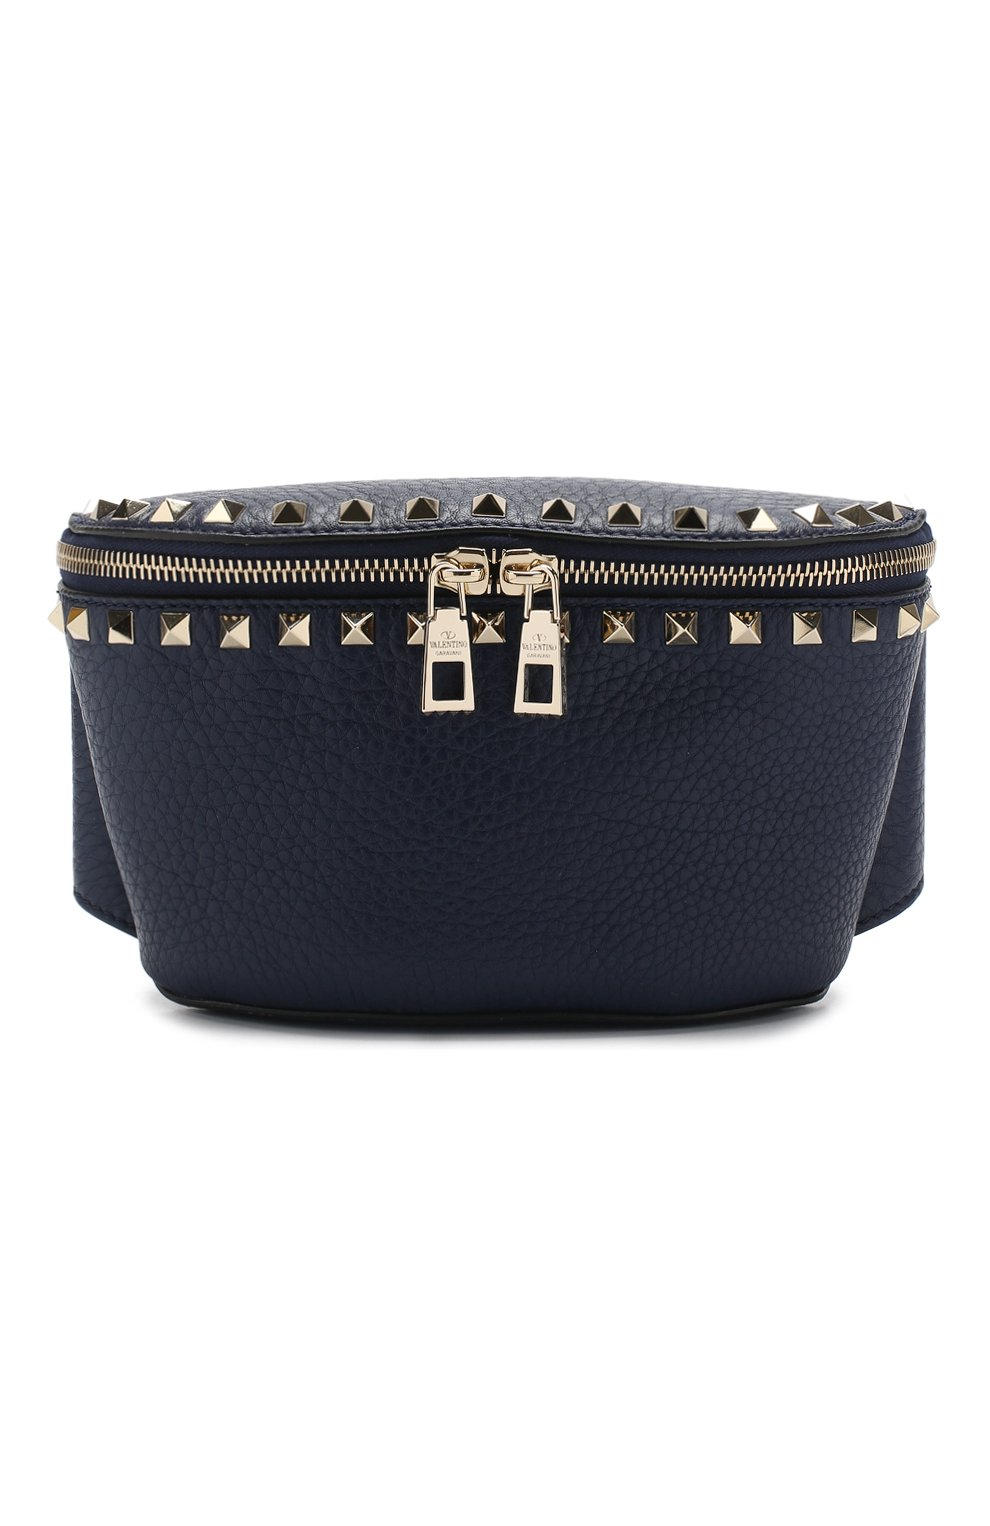 Поясная сумка Valentino Garavani Rockstud Valentino темно-синяя | Фото №1